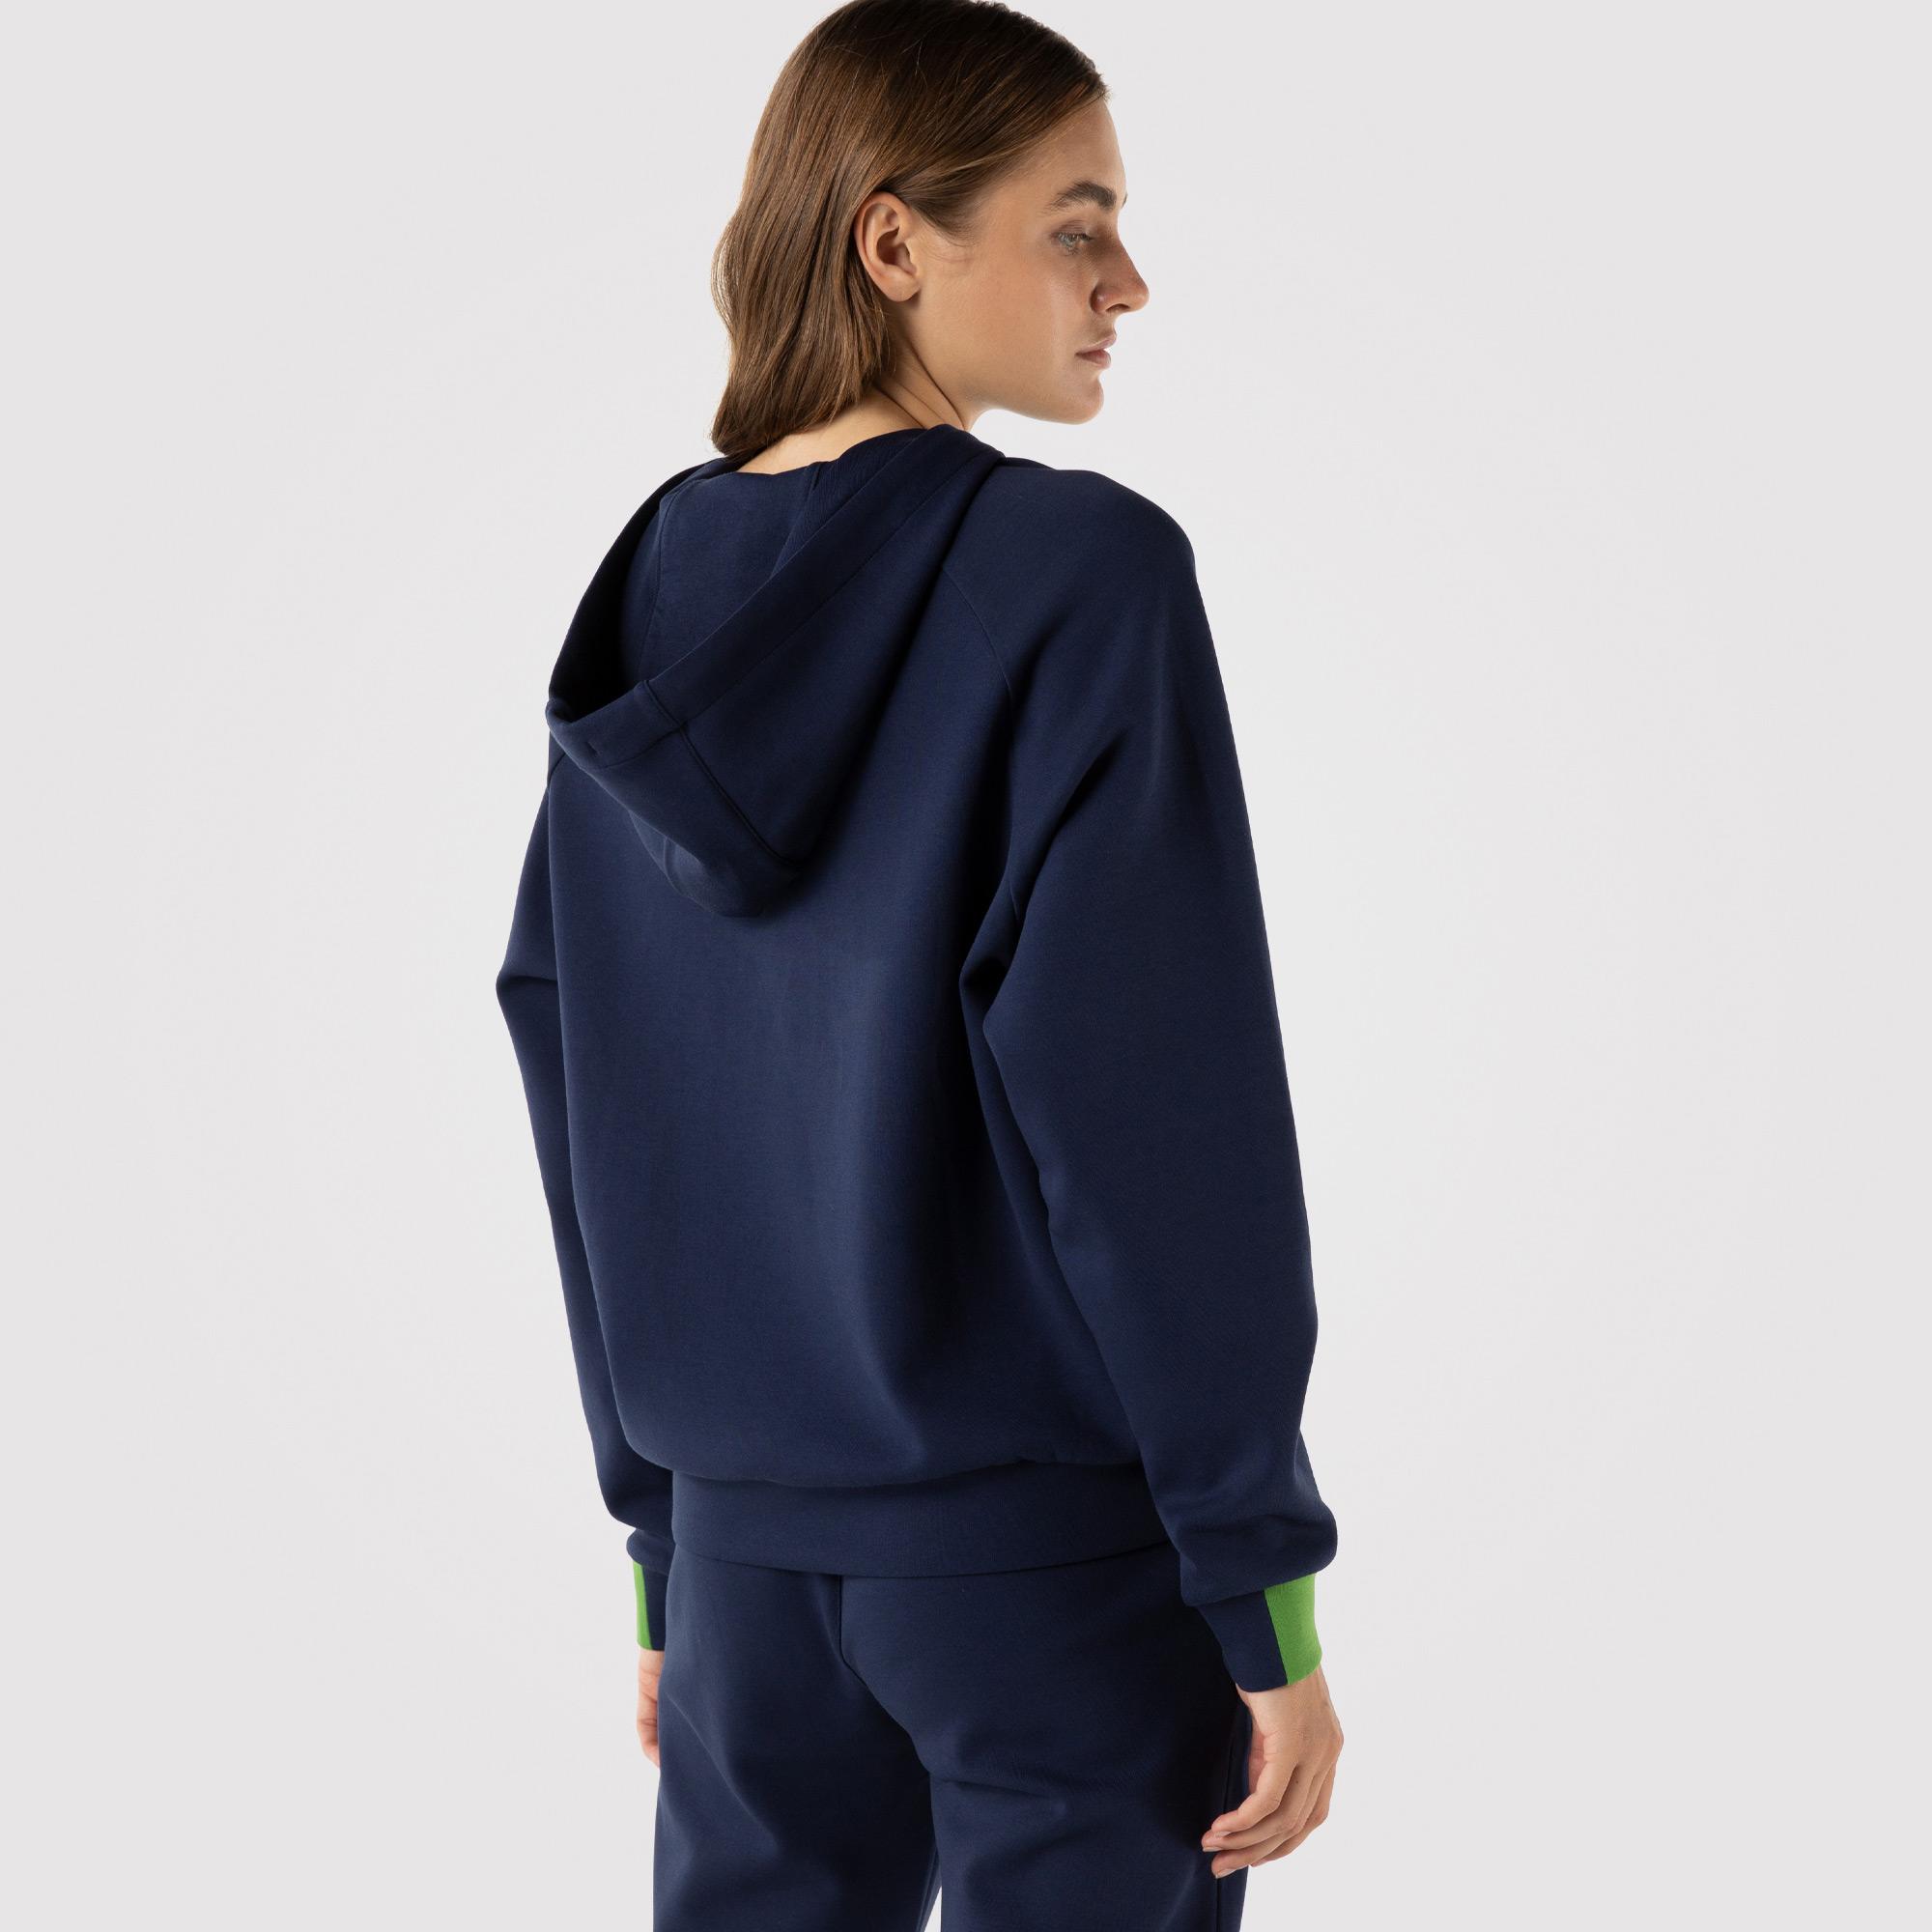 Lacoste SPORT Kadın Regular Fit Kapüşonlu Lacivert Sweatshirt